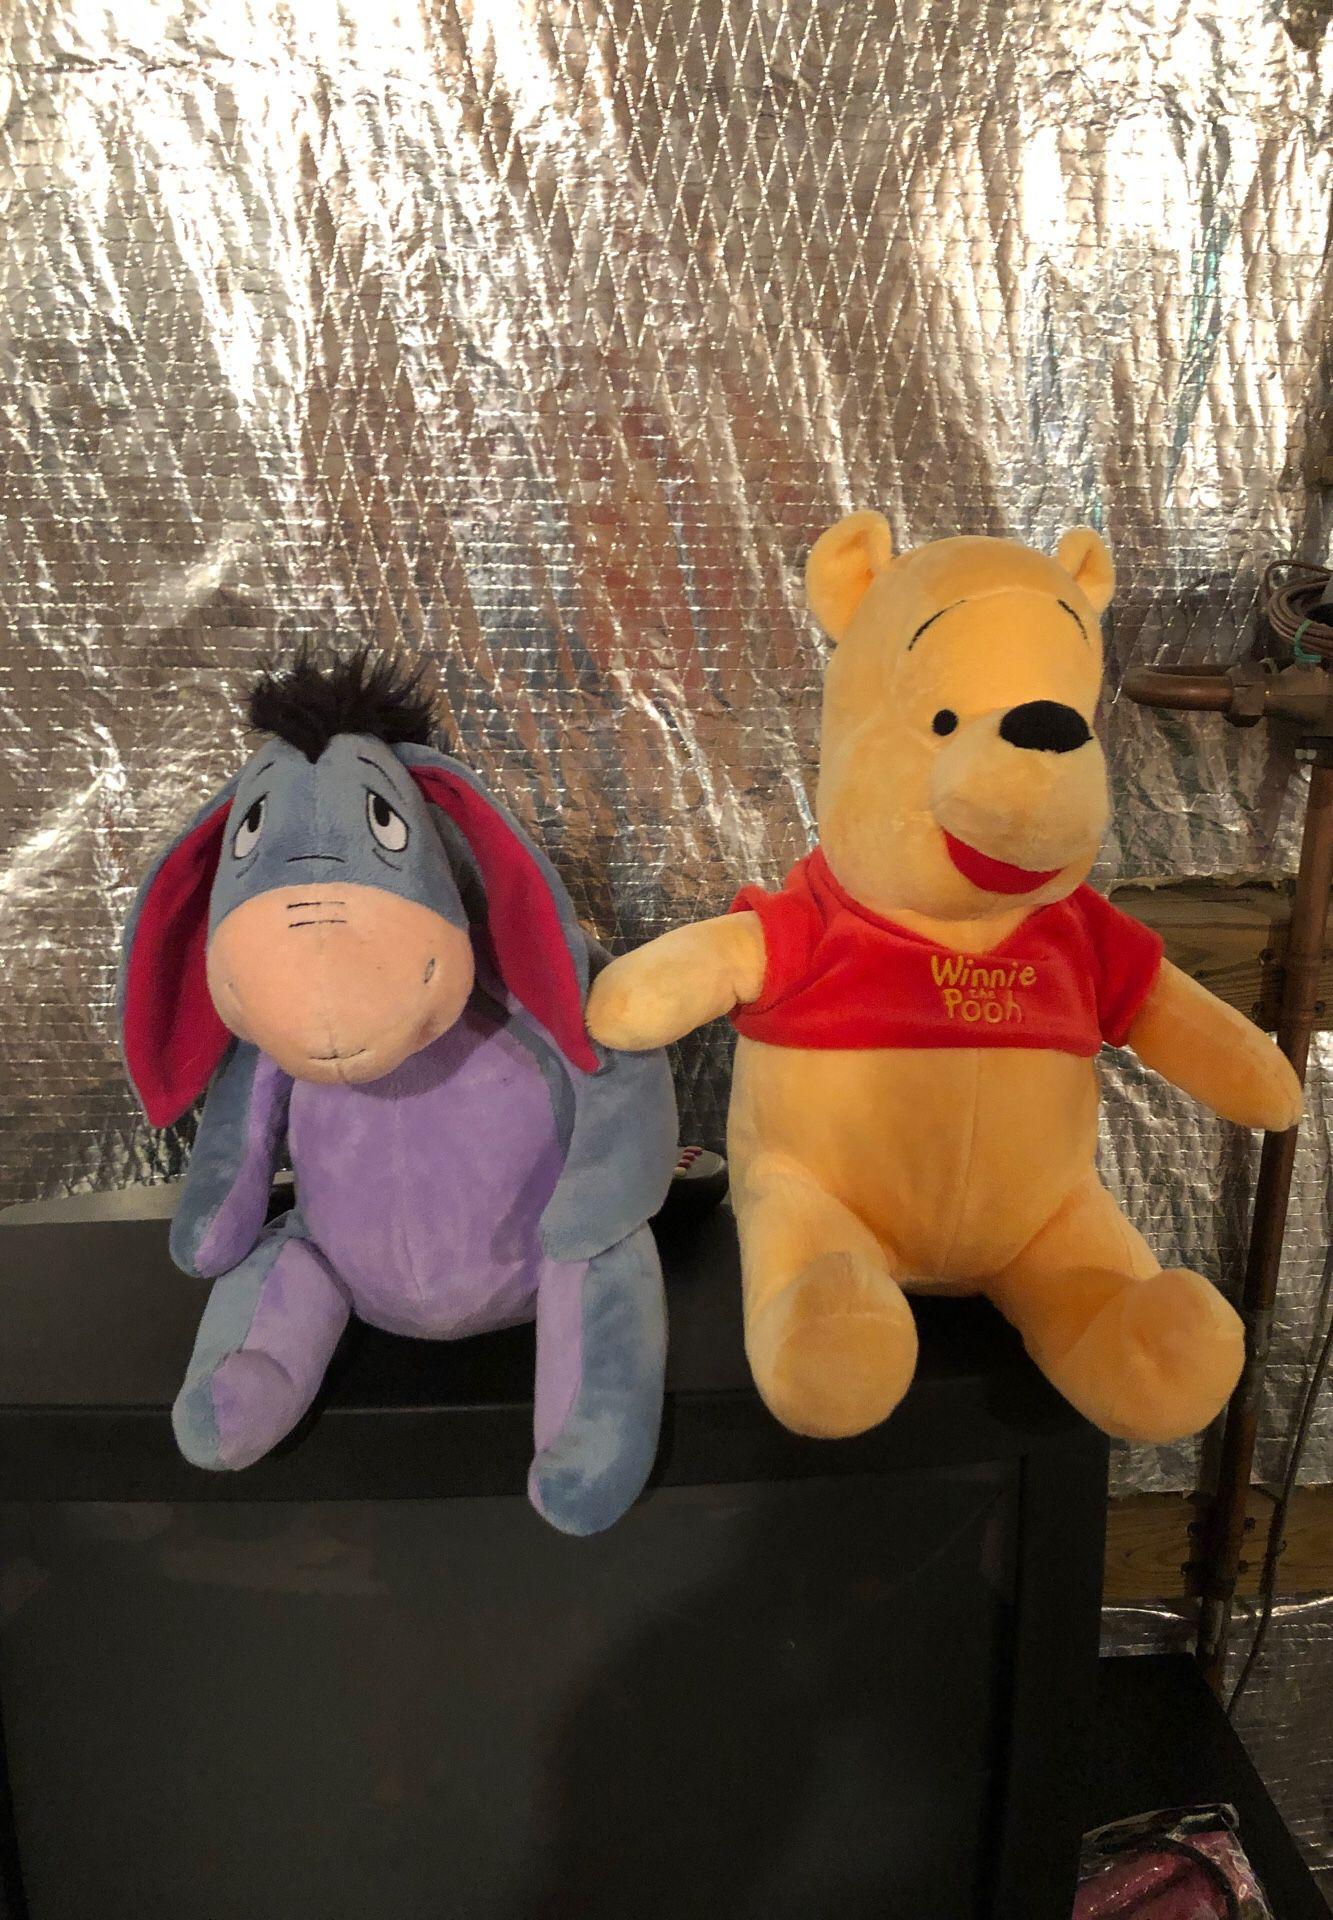 Pooh and eeyore plush dolls